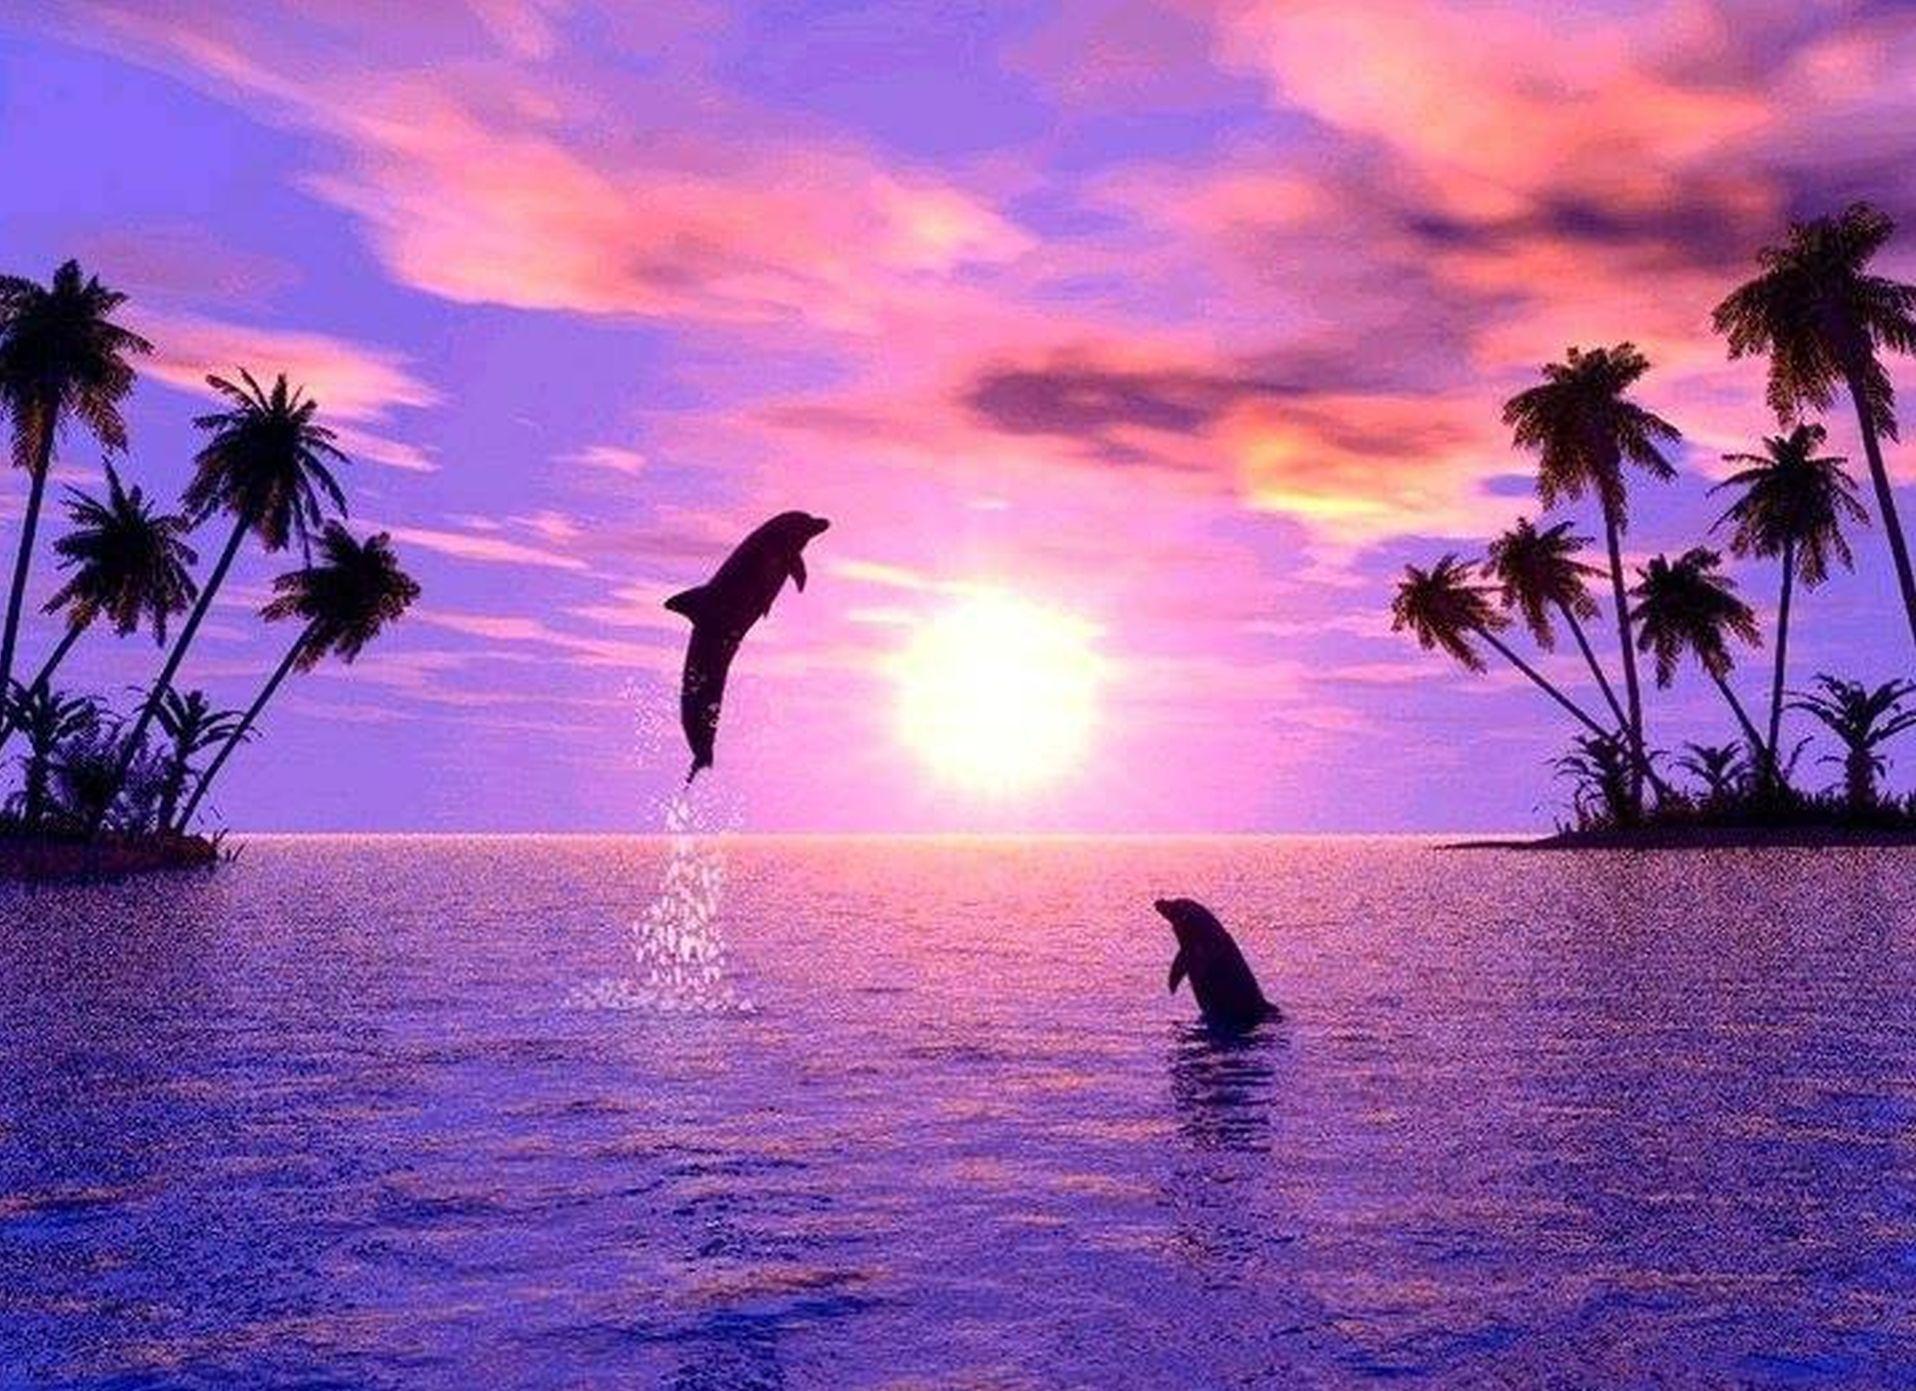 Purple Dolphin Wallpaper Hd For Desktop Wallpaper 1916 X 1391 Px 800 83 Kb Dolphin Purple Heart Baby Jumping Cute Dolphins Nature Sunset Full hd dolphin wallpapers hd desktop